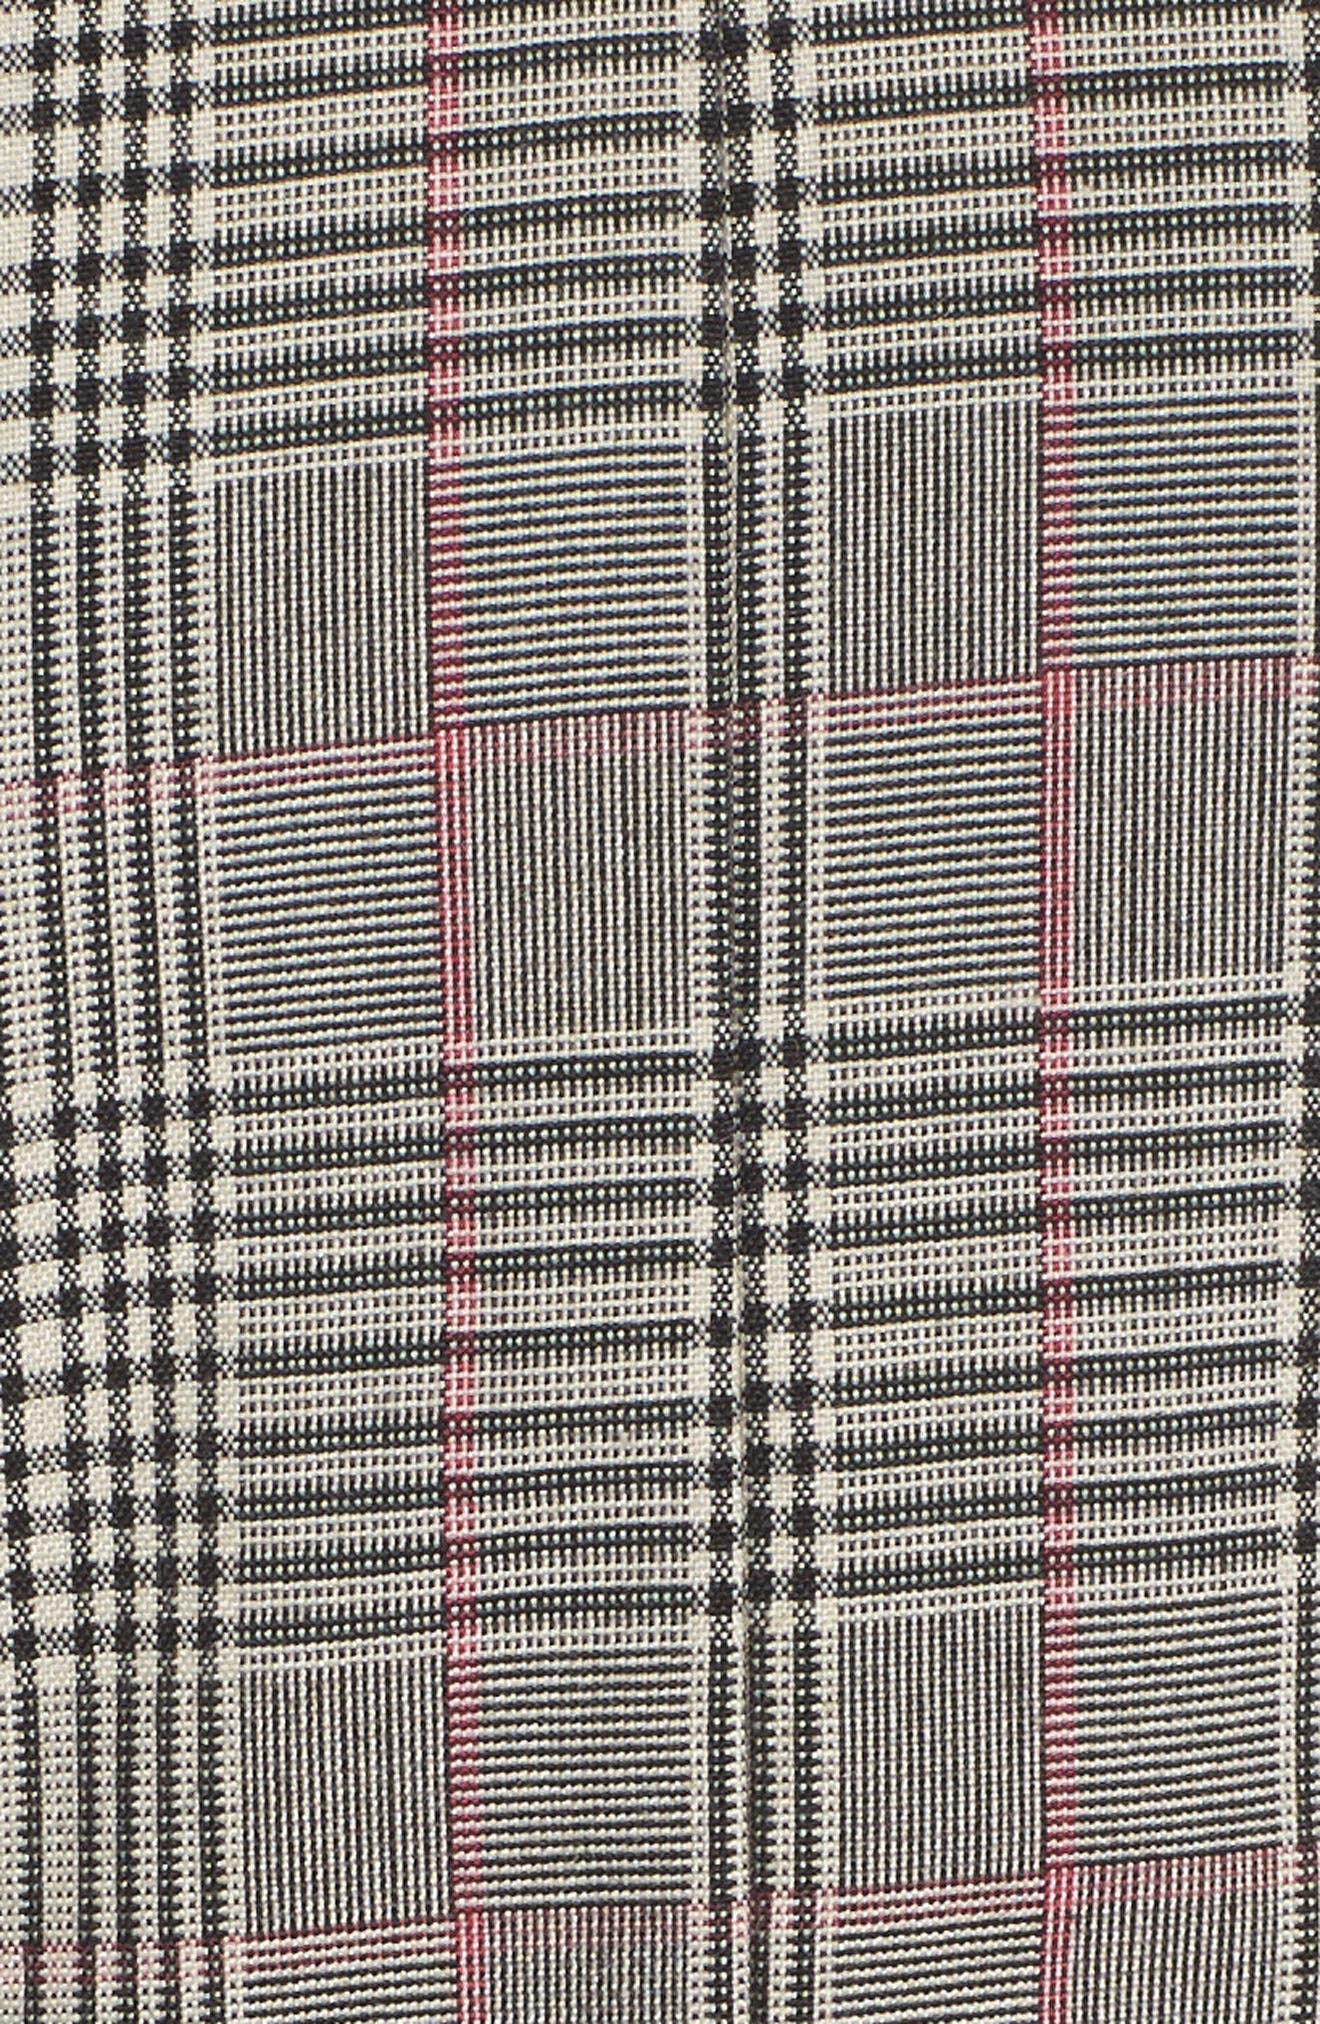 Aurora Plaid Tie Sheath,                             Alternate thumbnail 5, color,                             060